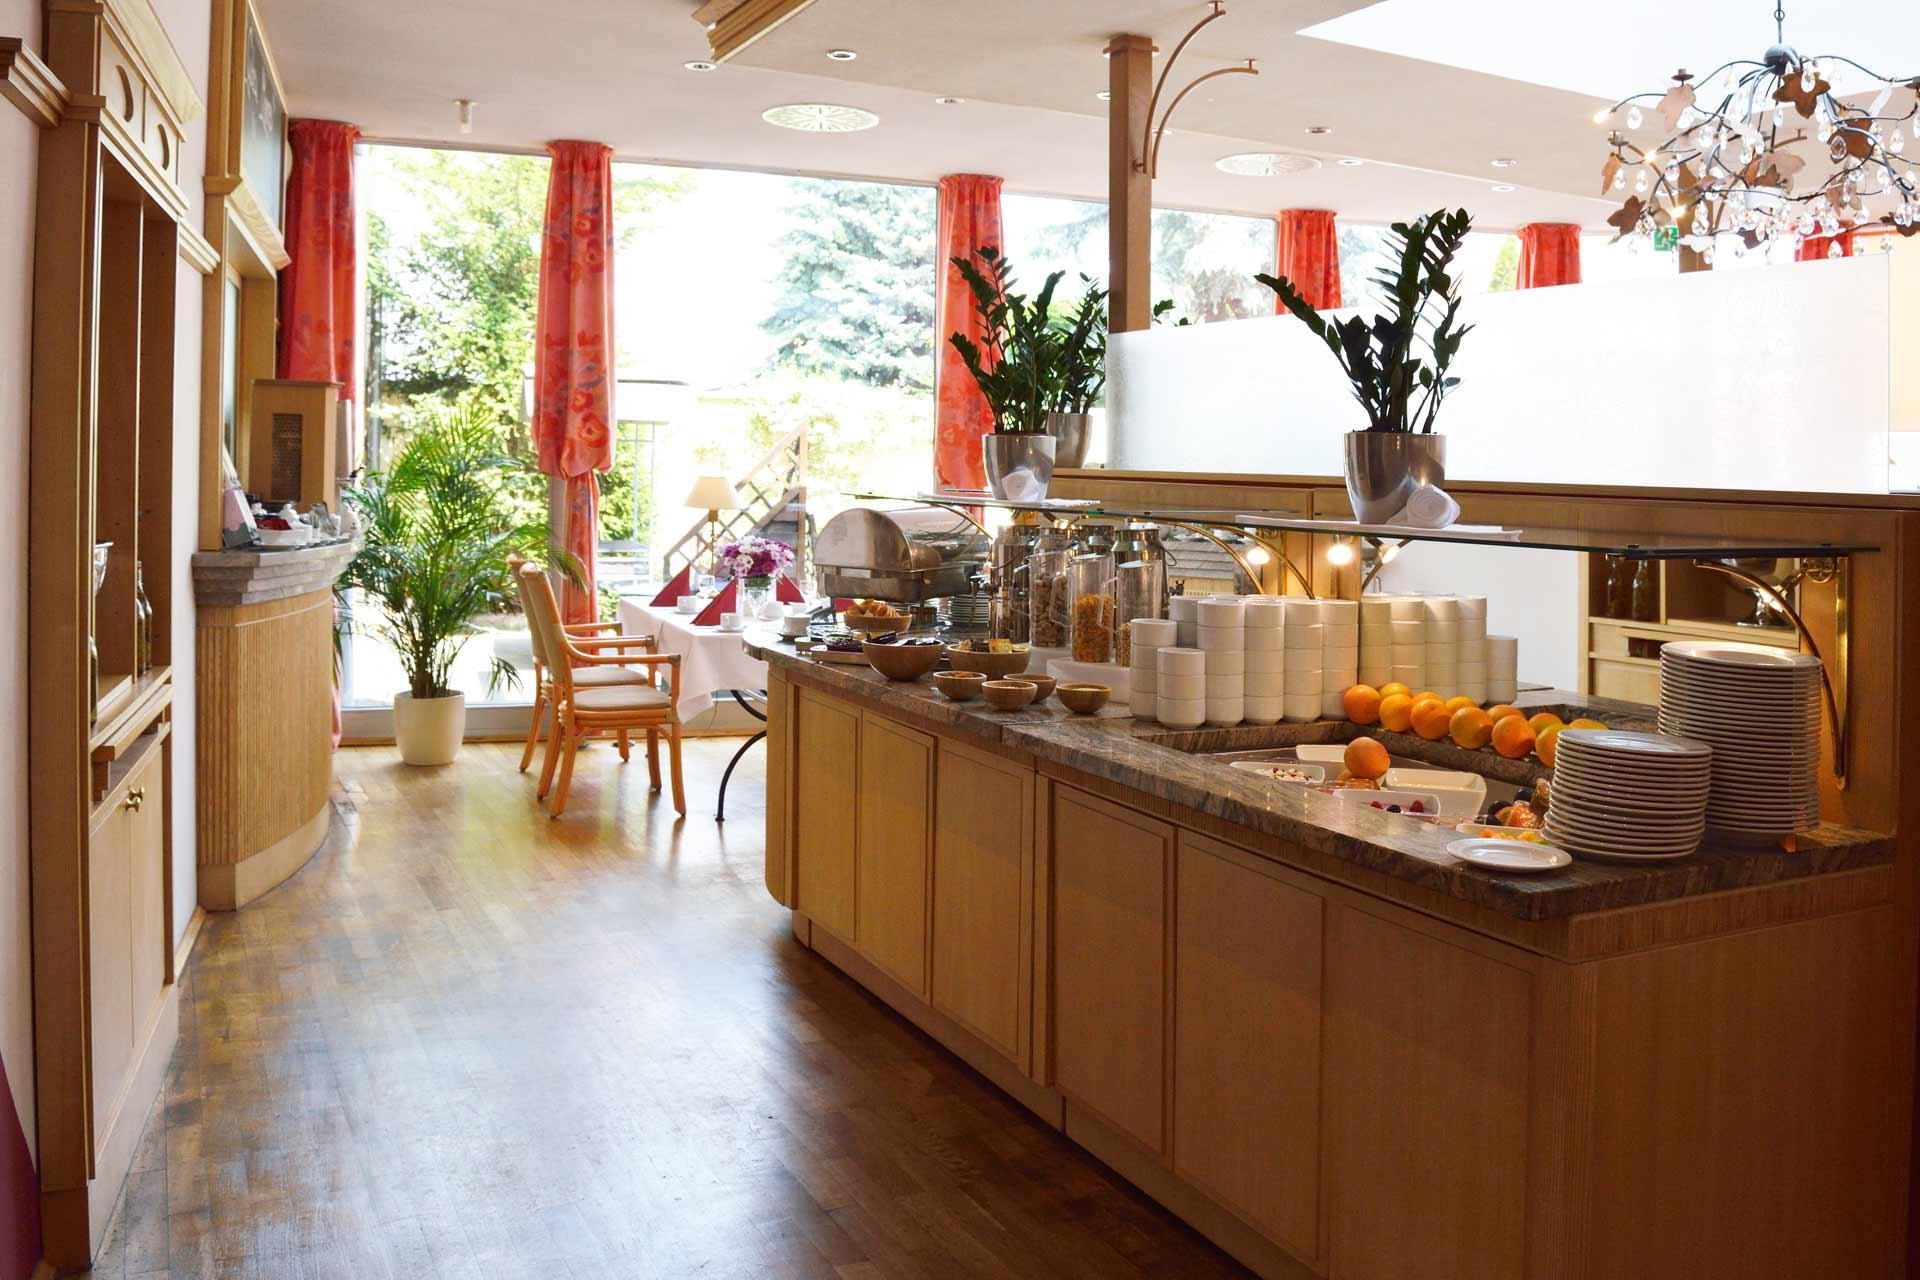 Frühstücksbuffet Best Western Hotel Halle-Merseburg